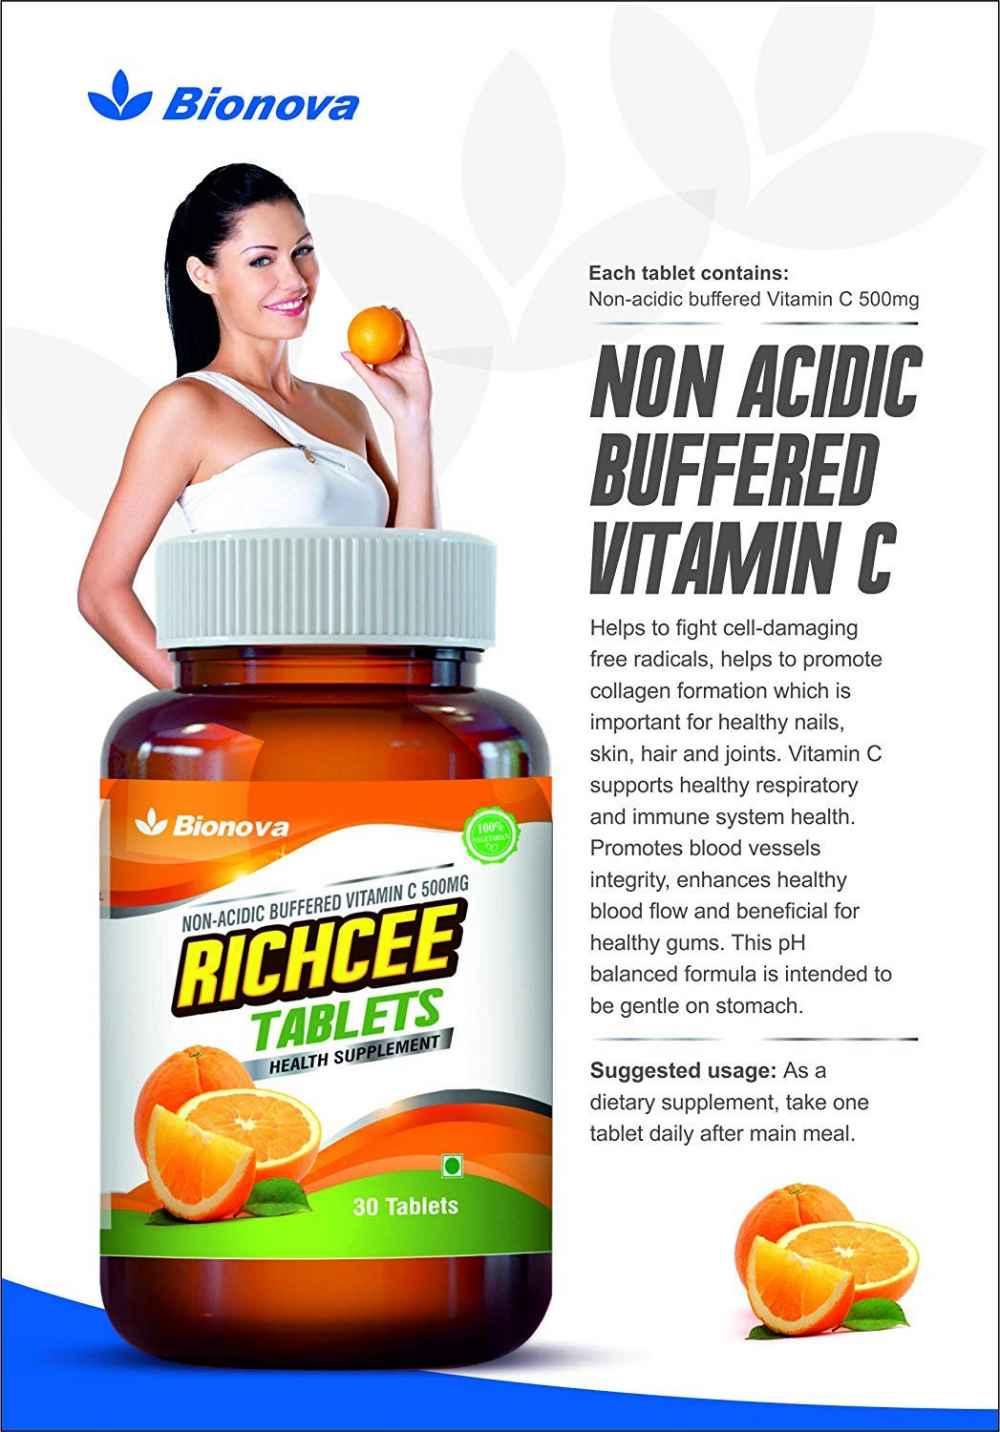 Bionova Vitamin C 500Mg (Non-Acidic | Buffered Vitamin C) - gentle on stomach